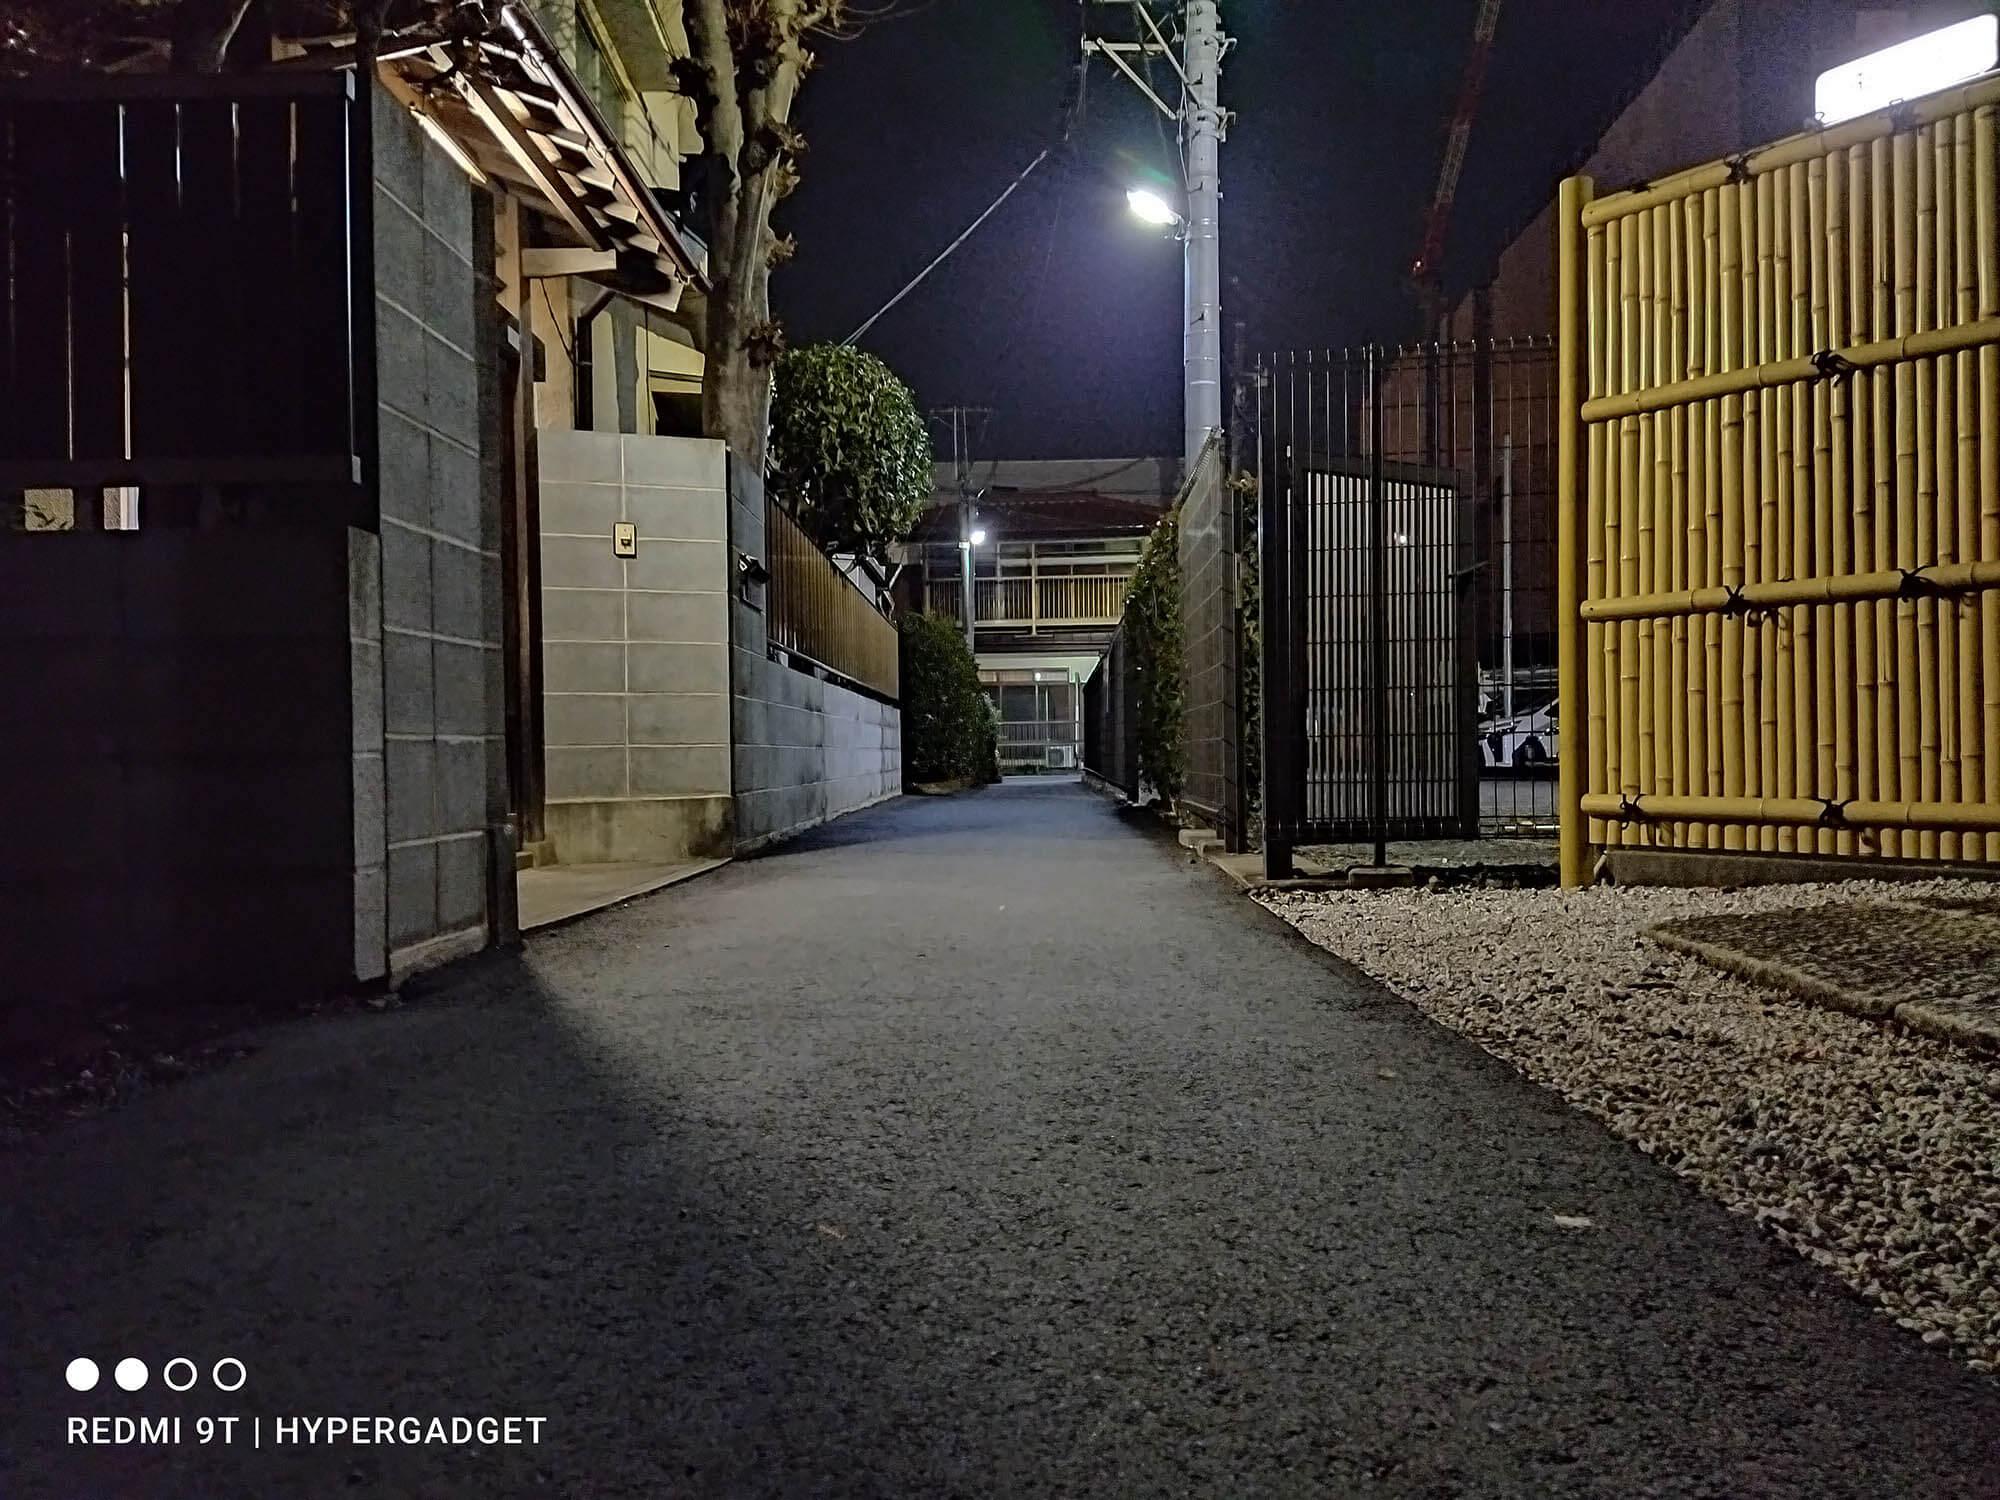 Xiaomi Redmi 9Tの夜景モードで撮影した町並みの写真